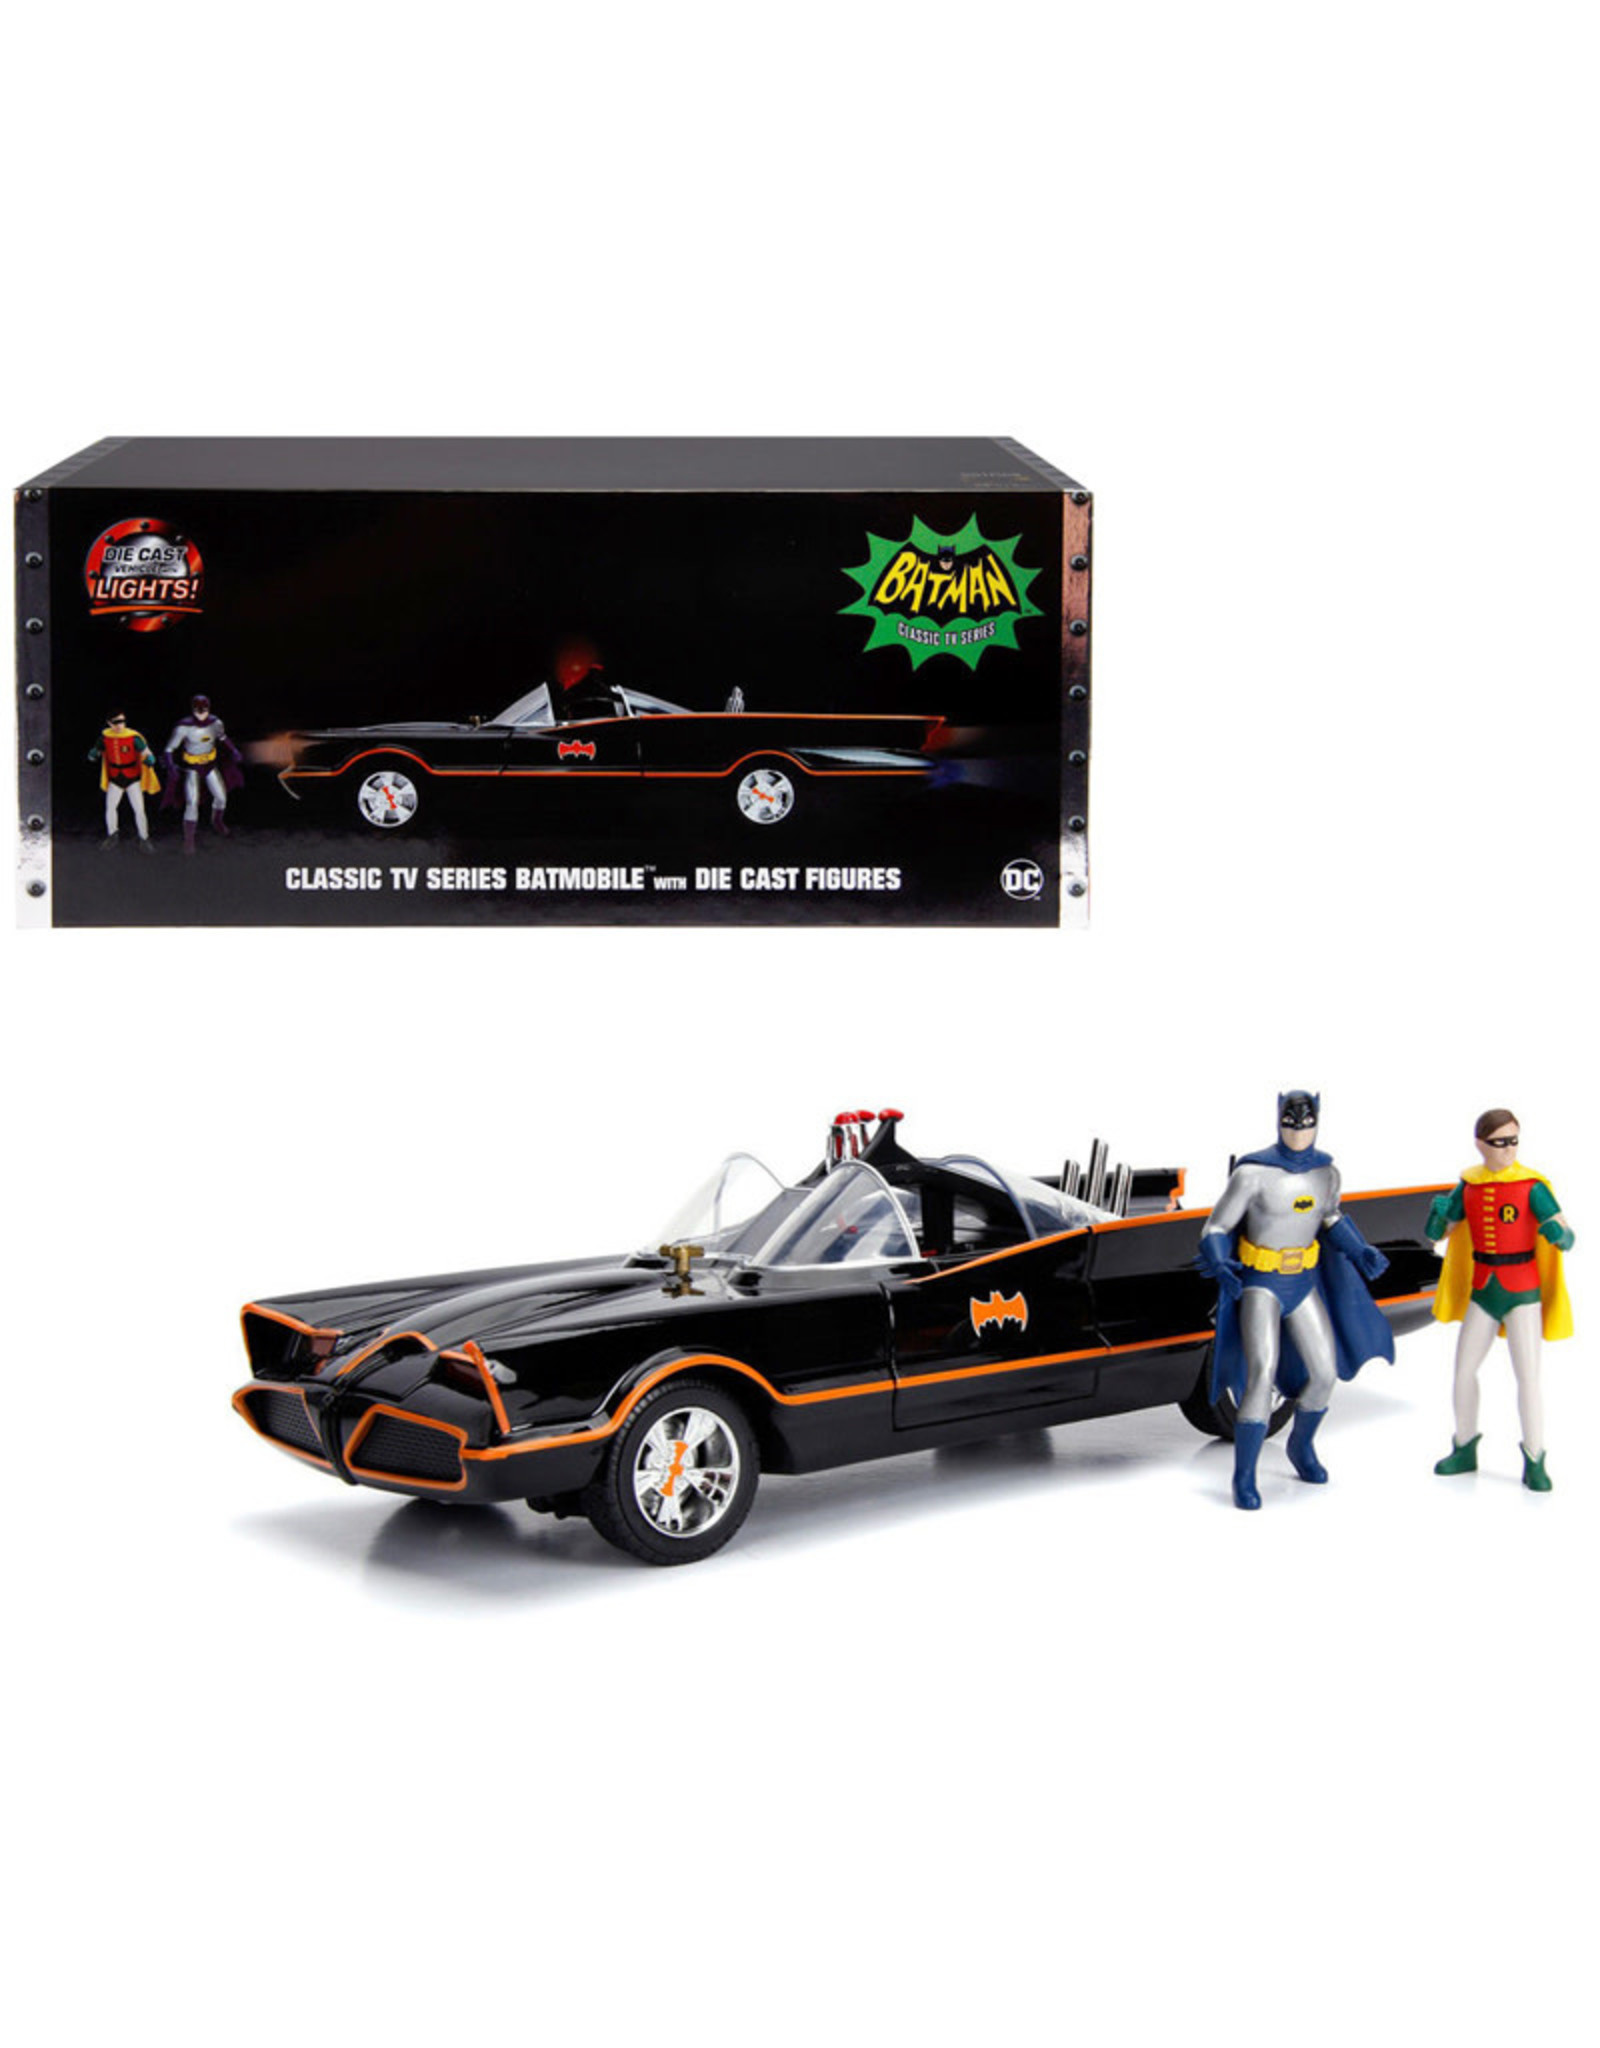 Jada Toys Batman 1966 TV Series Batmobile 1:18 Scale Die-Cast Metal Vehicle with Lights 3-Inch Batman and Robin Figures